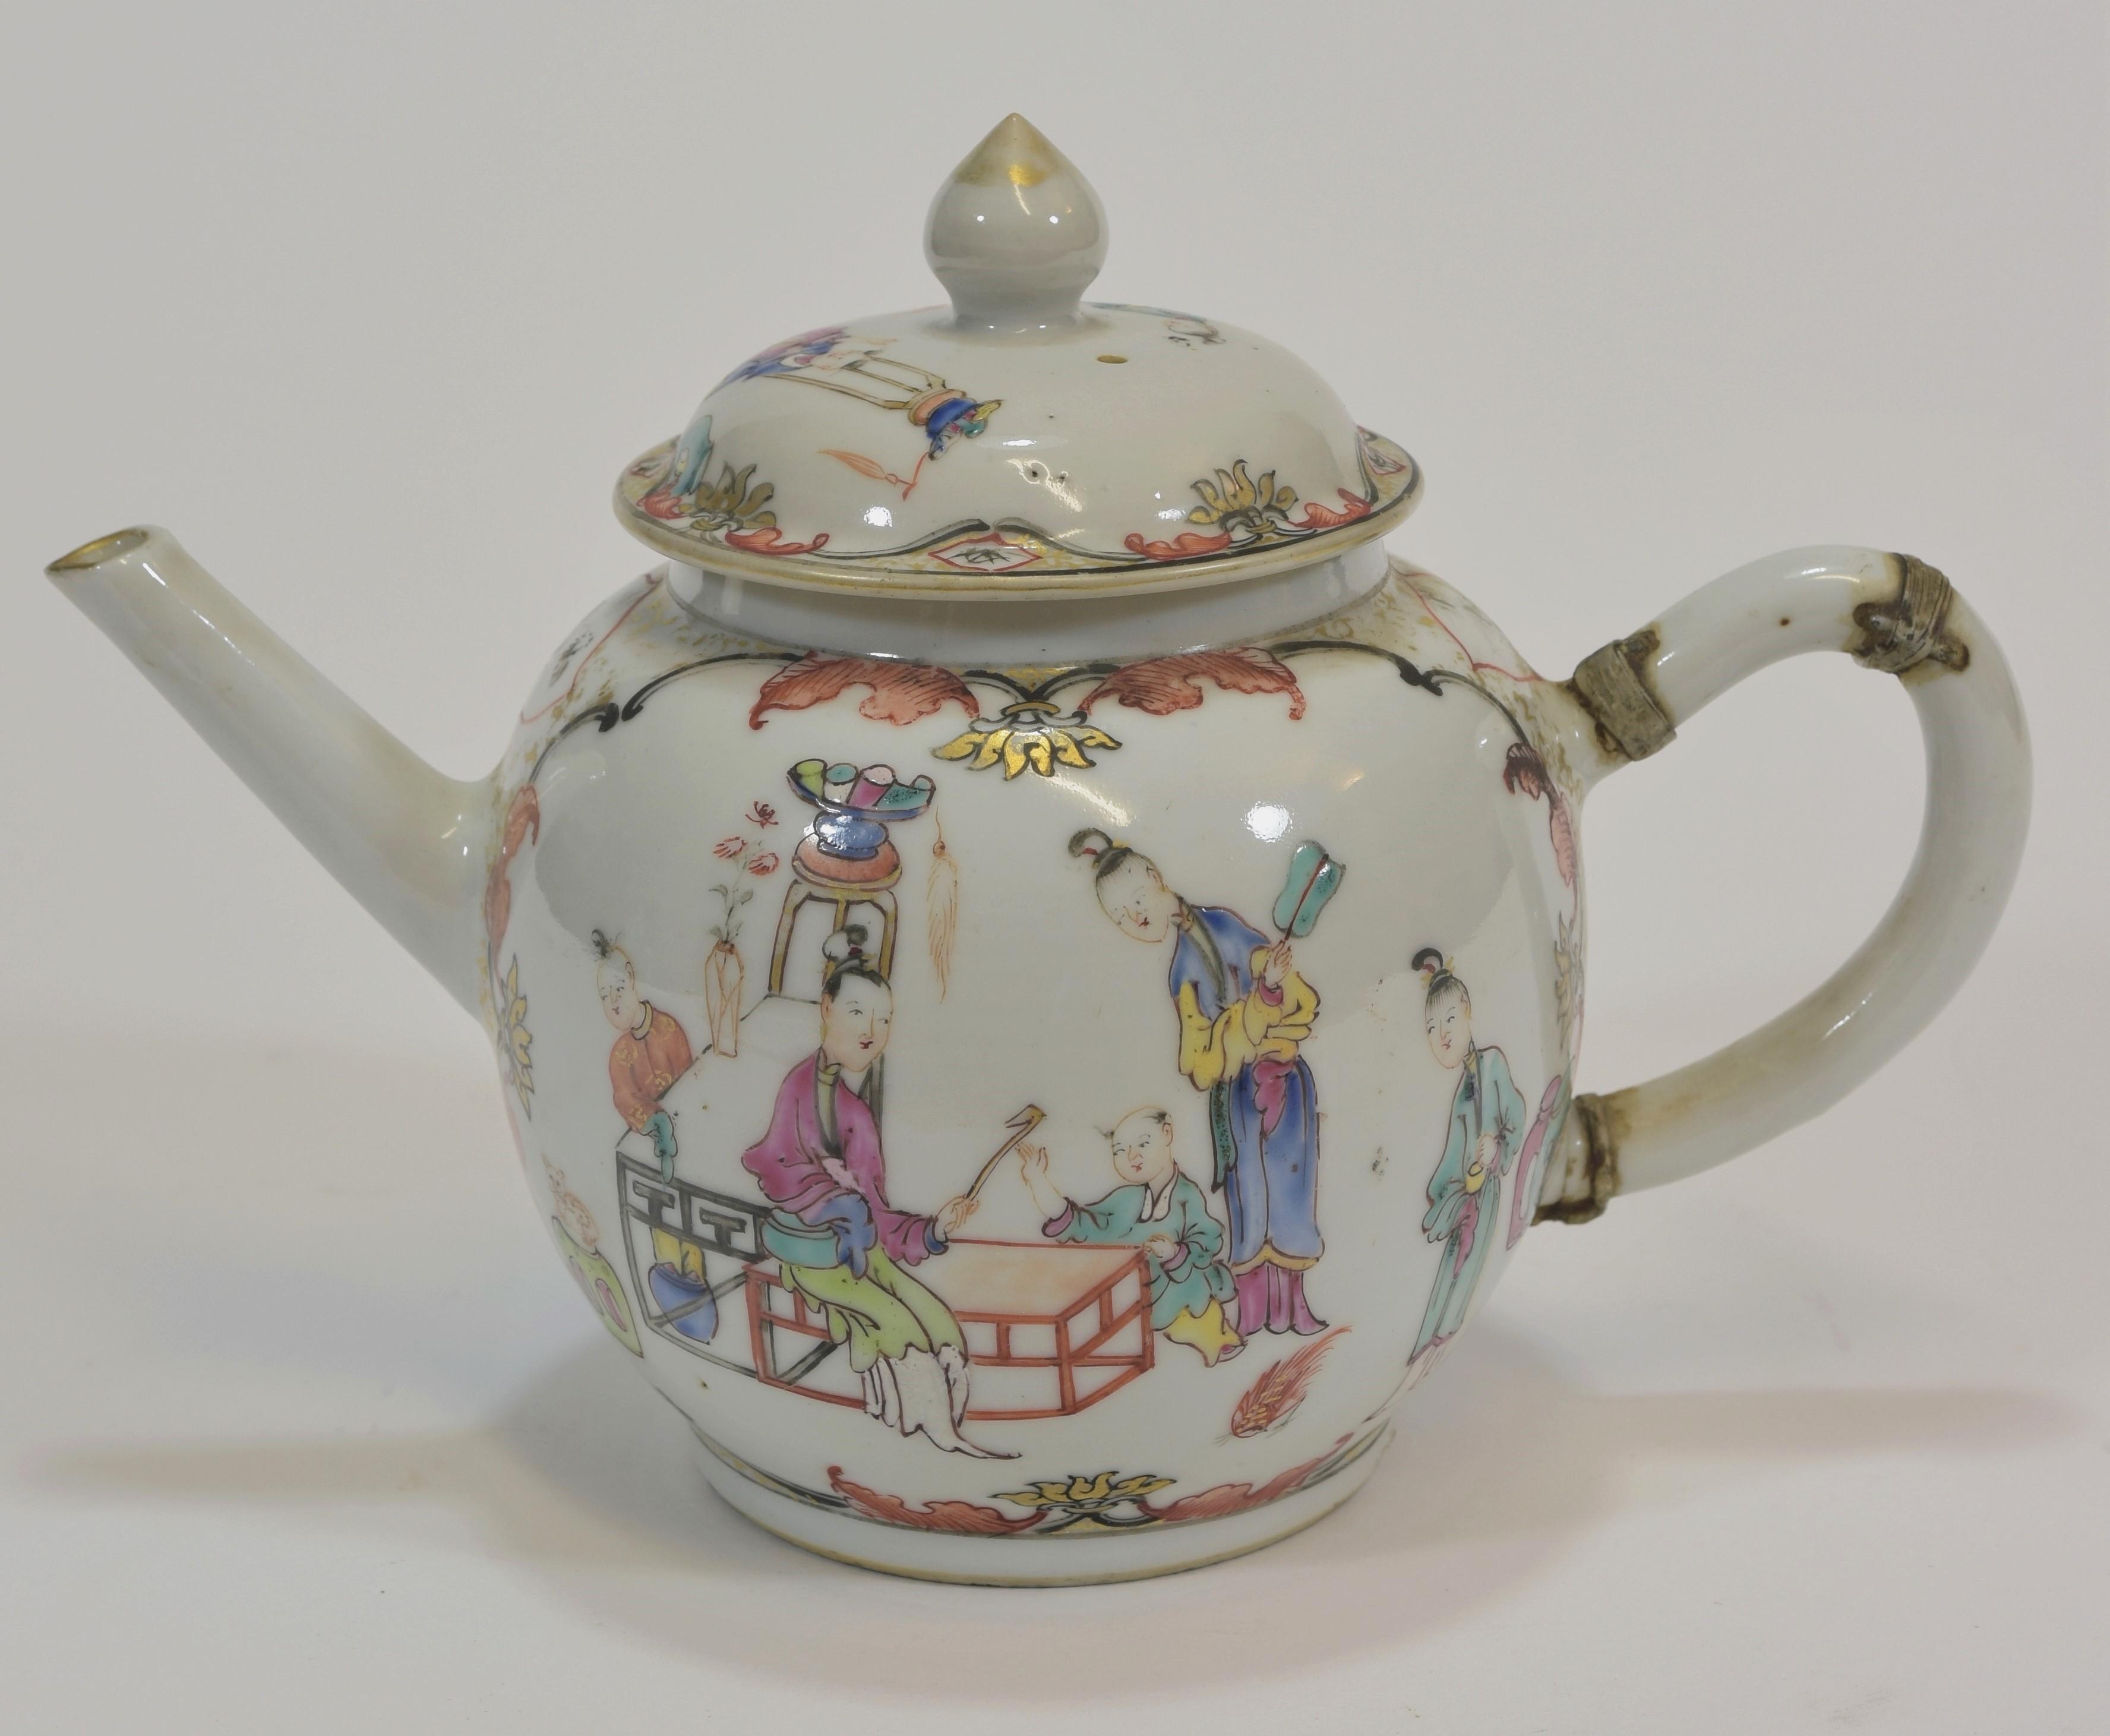 Lot 1 - Two 18th century famille rose tea pots 15cm (2) 清 十八世紀 粉彩茶壺兩個